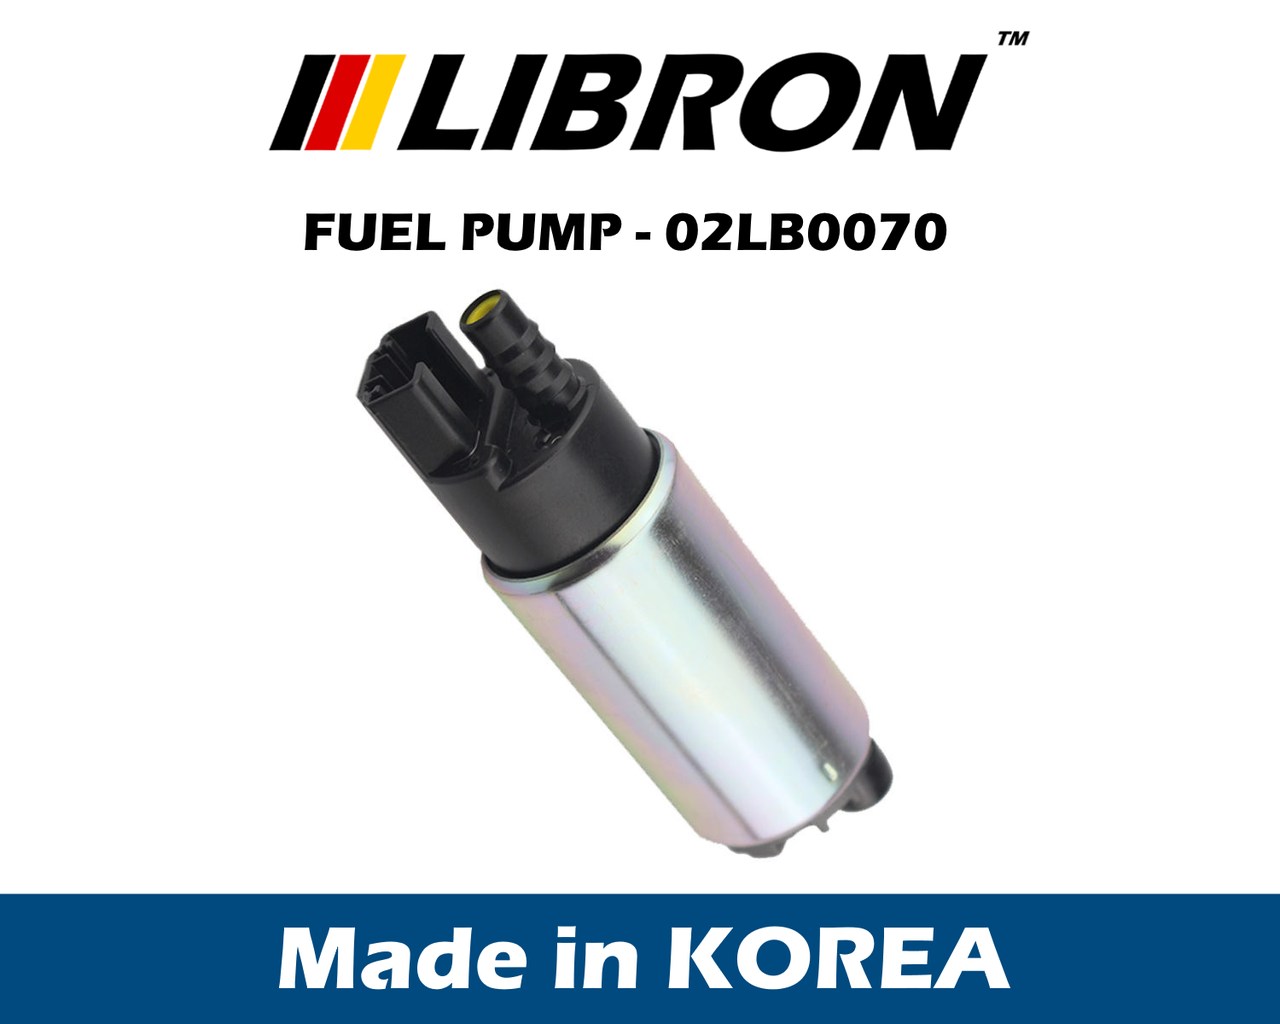 Бензонасос LIBRON 02LB0070 - NISSAN 200 SX (S14) (1993-1999)